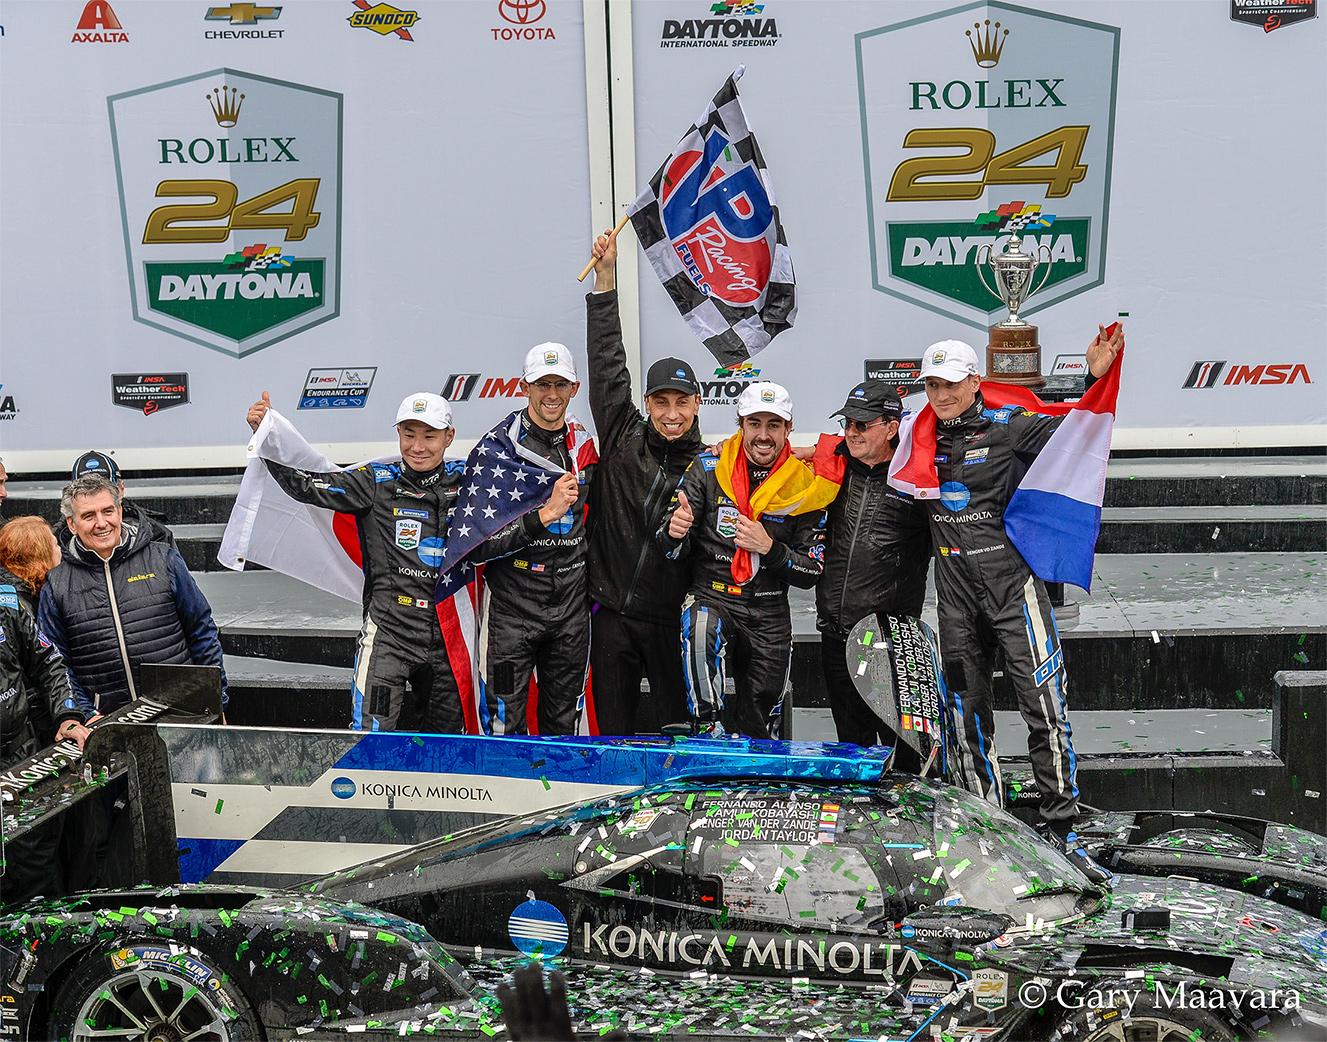 TrackWorthy - Rolex 24_victory podium_winners_#10